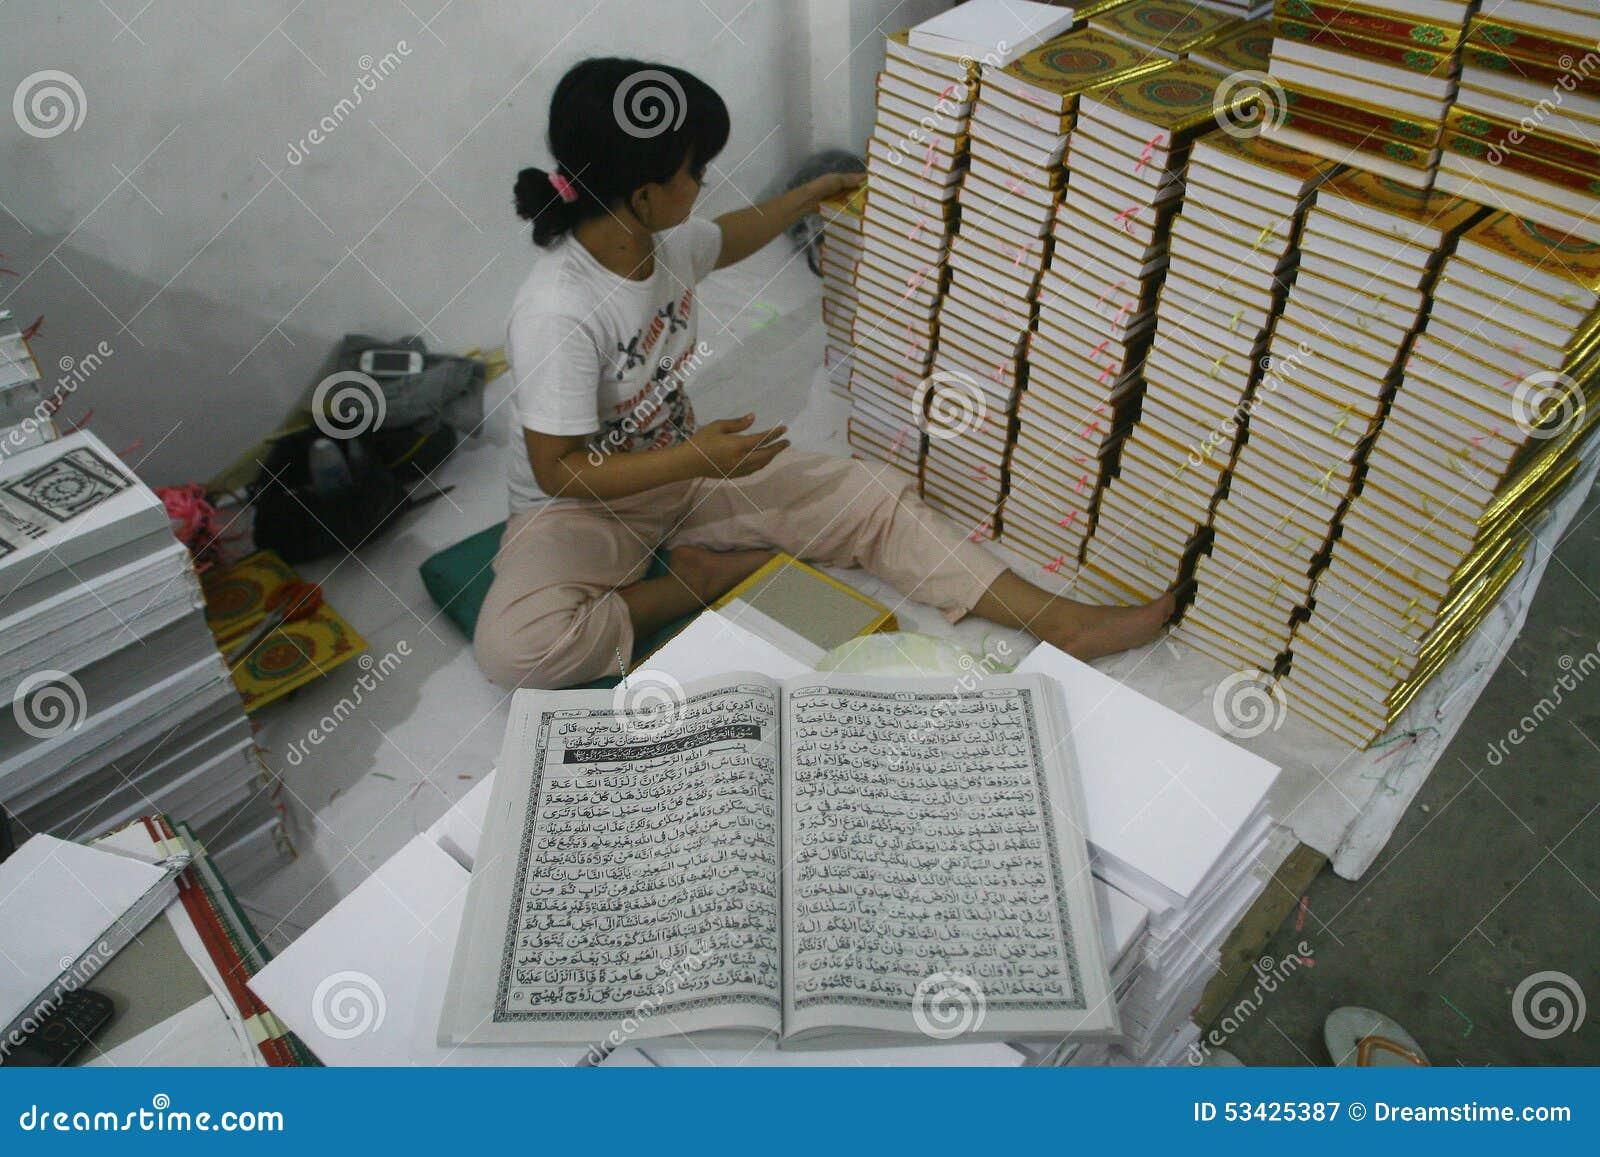 Al Quran Production In Indonesia